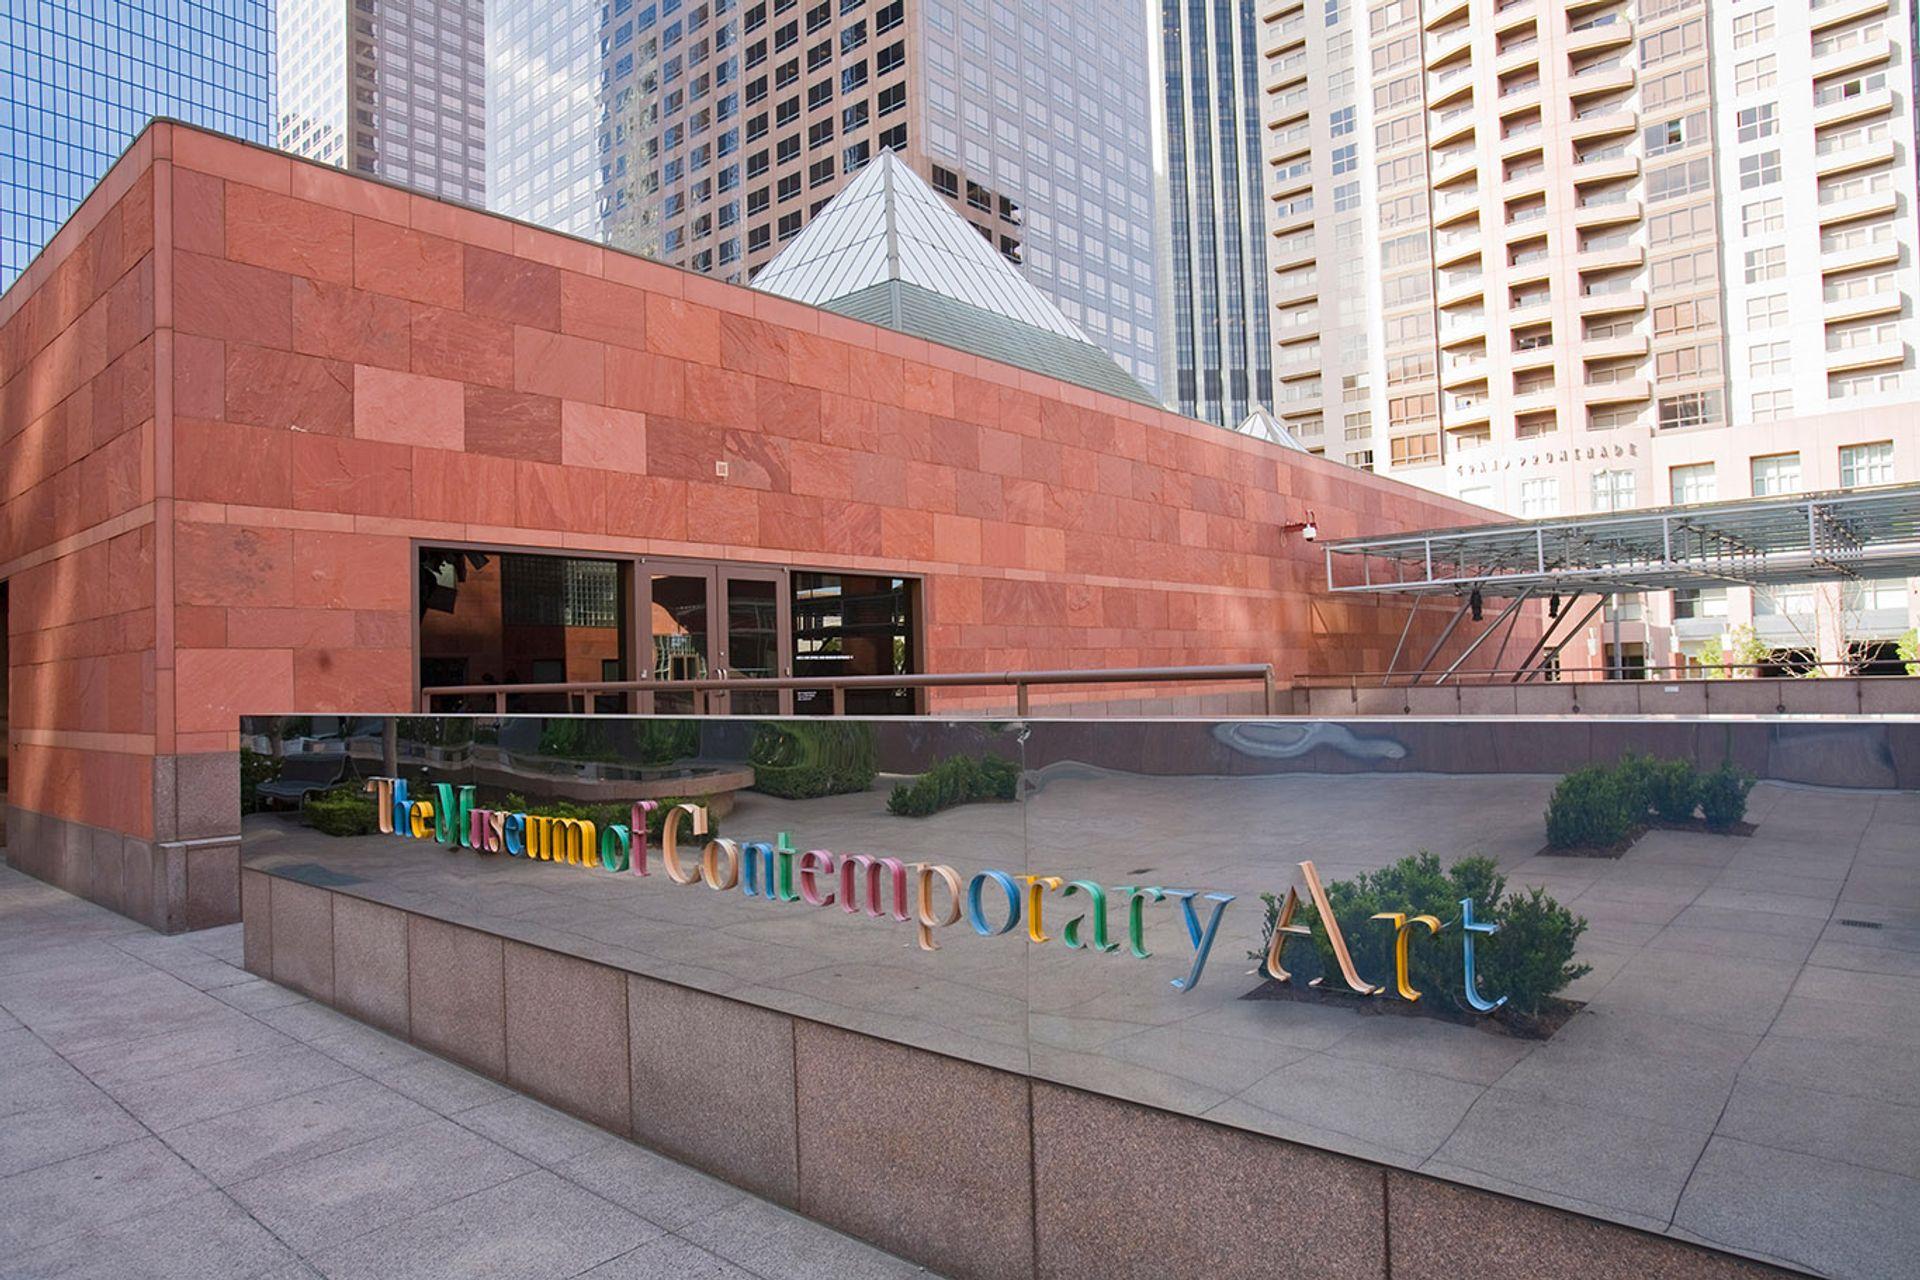 The Museum of Contemporary Art, Los Angeles Danita Delimont/Alamy Stock Photo